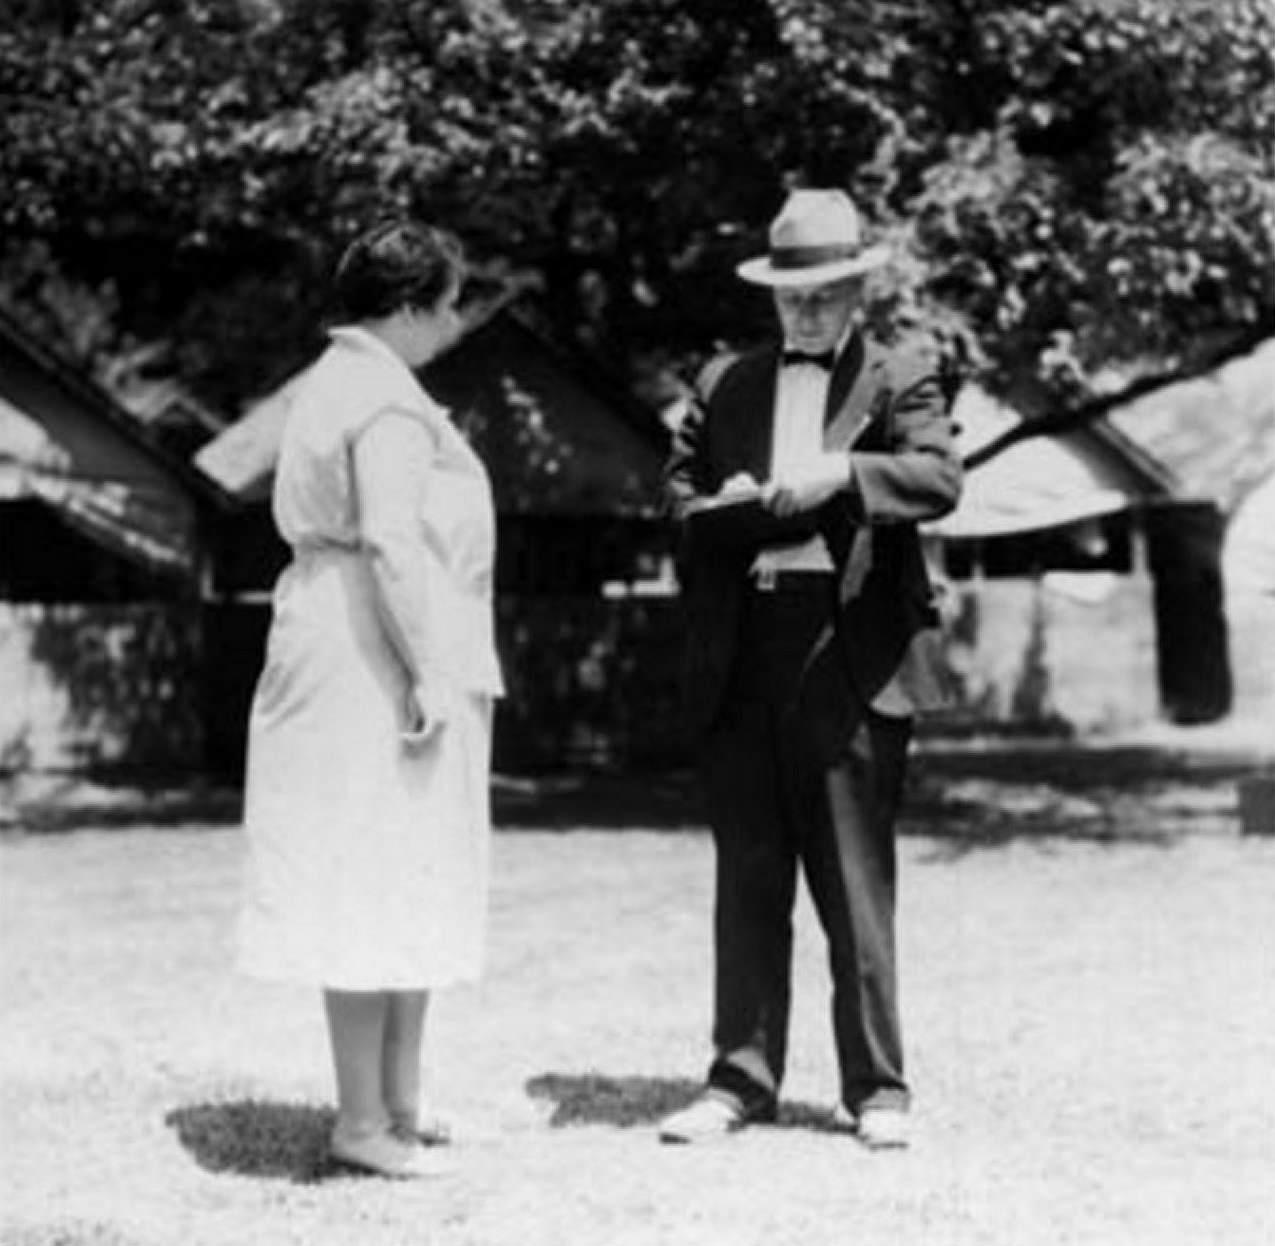 1925-c-Tollendale-Allandale-The Gables Camp-Inspector-inspecting the Camp in Allandale-located off Tollendale Rd.